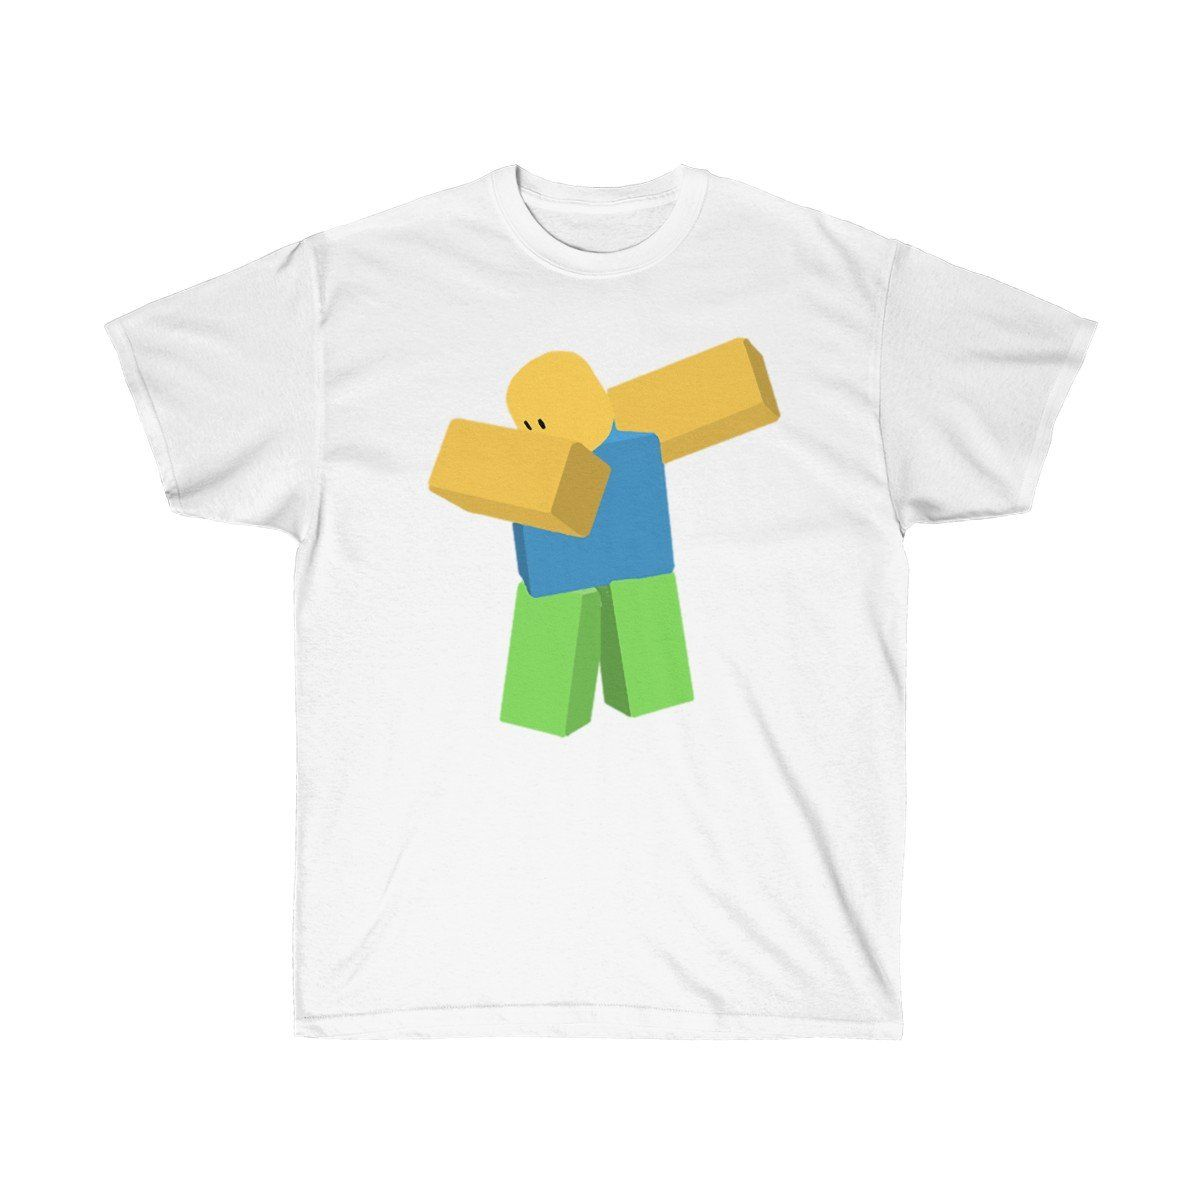 Oof Roblox Dab Meme T Shirt T Shirt Shirts Memes